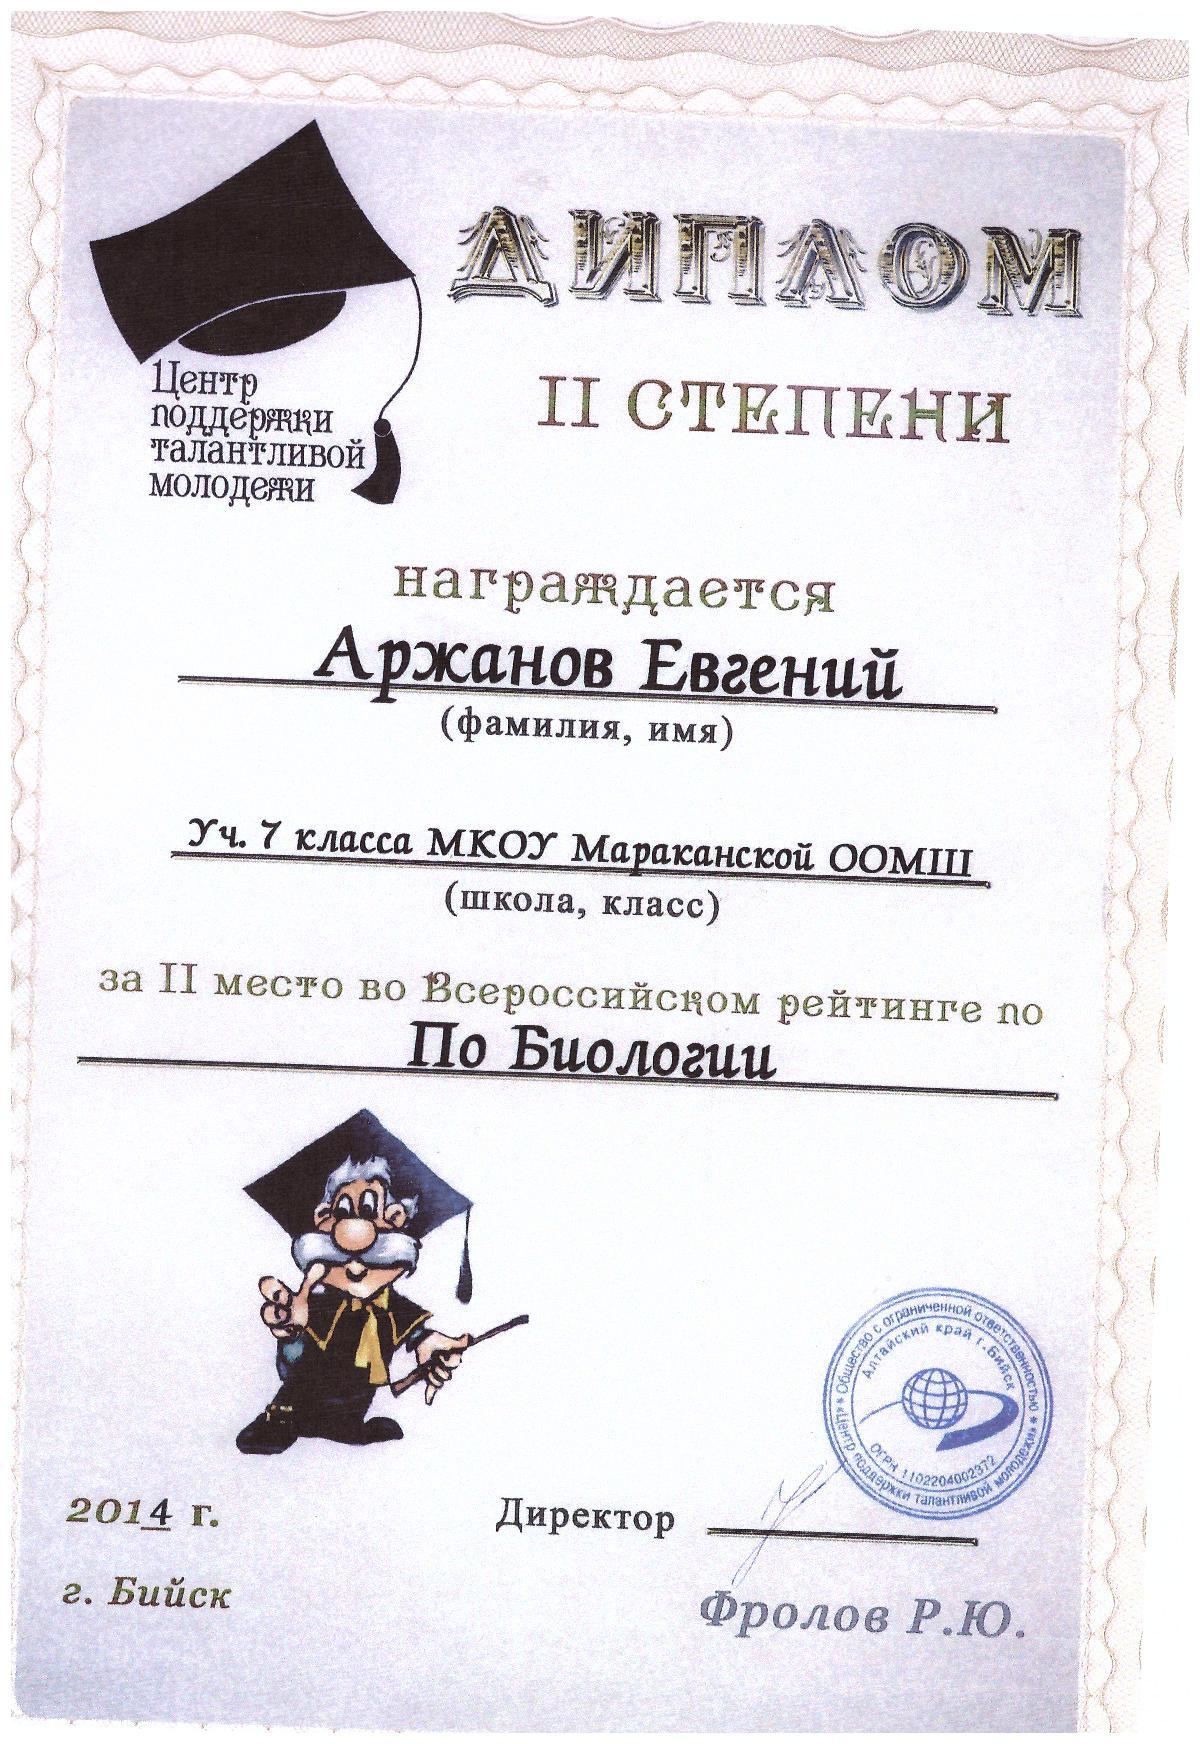 Грамота Аржанова Ж.